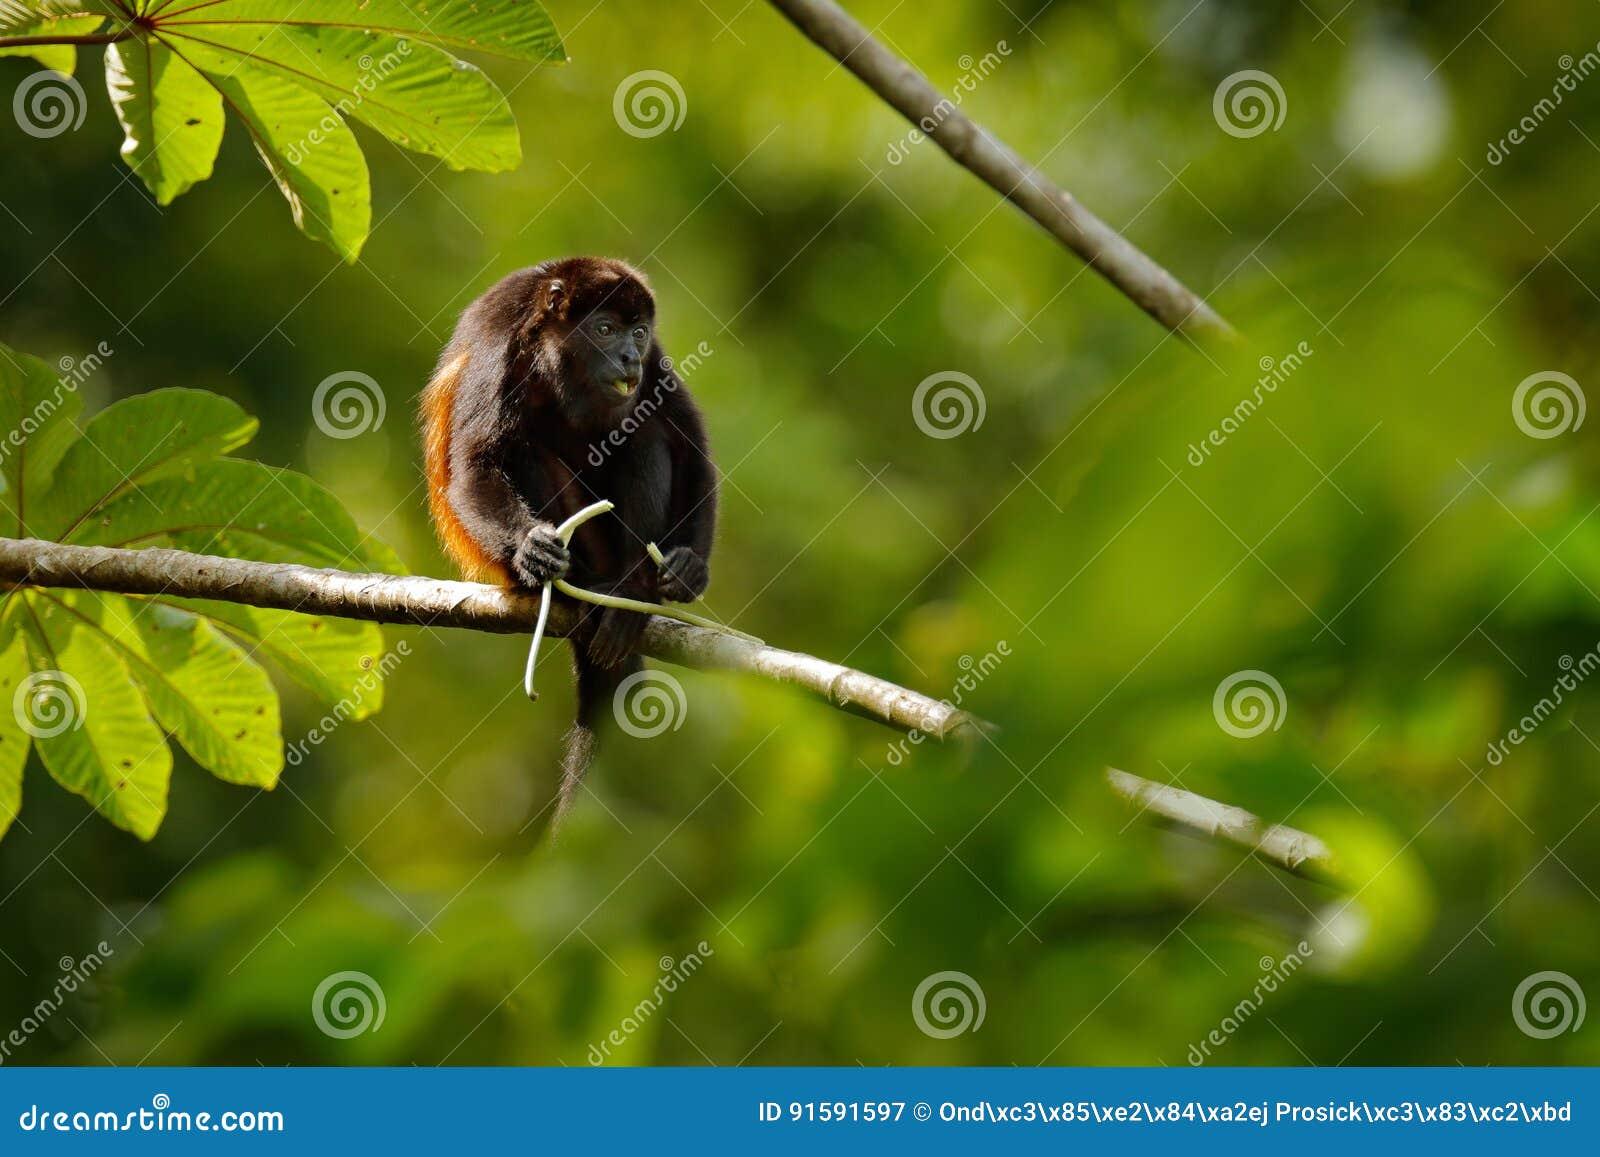 Macaco preto Palliata envolvido do Alouatta do macaco de furo no habitat da natureza Macaco preto que alimenta no macaco do preto